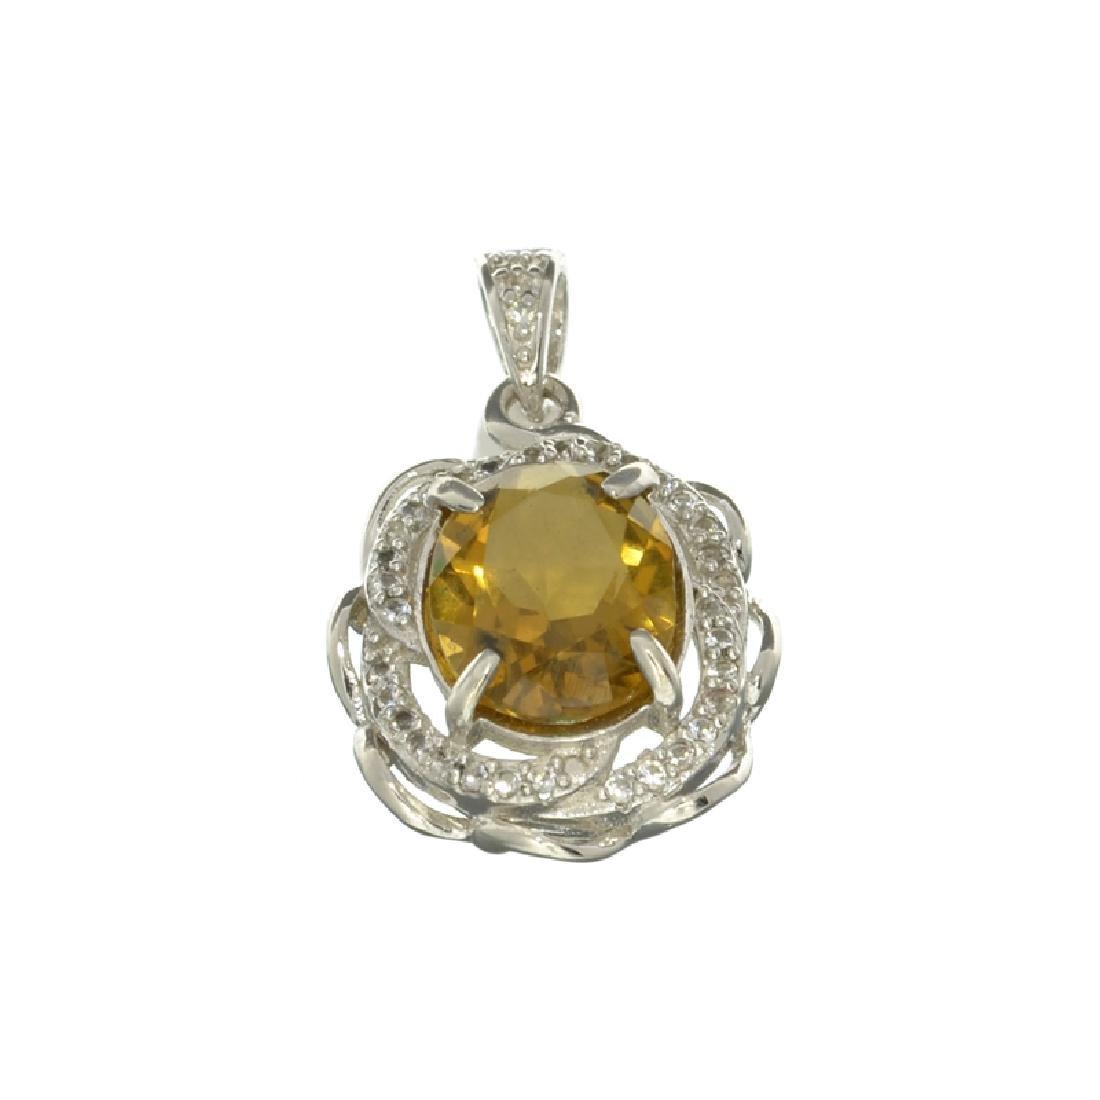 APP: 0.8k Fine Jewelry 2.50CT Oval Cut Citrine/White